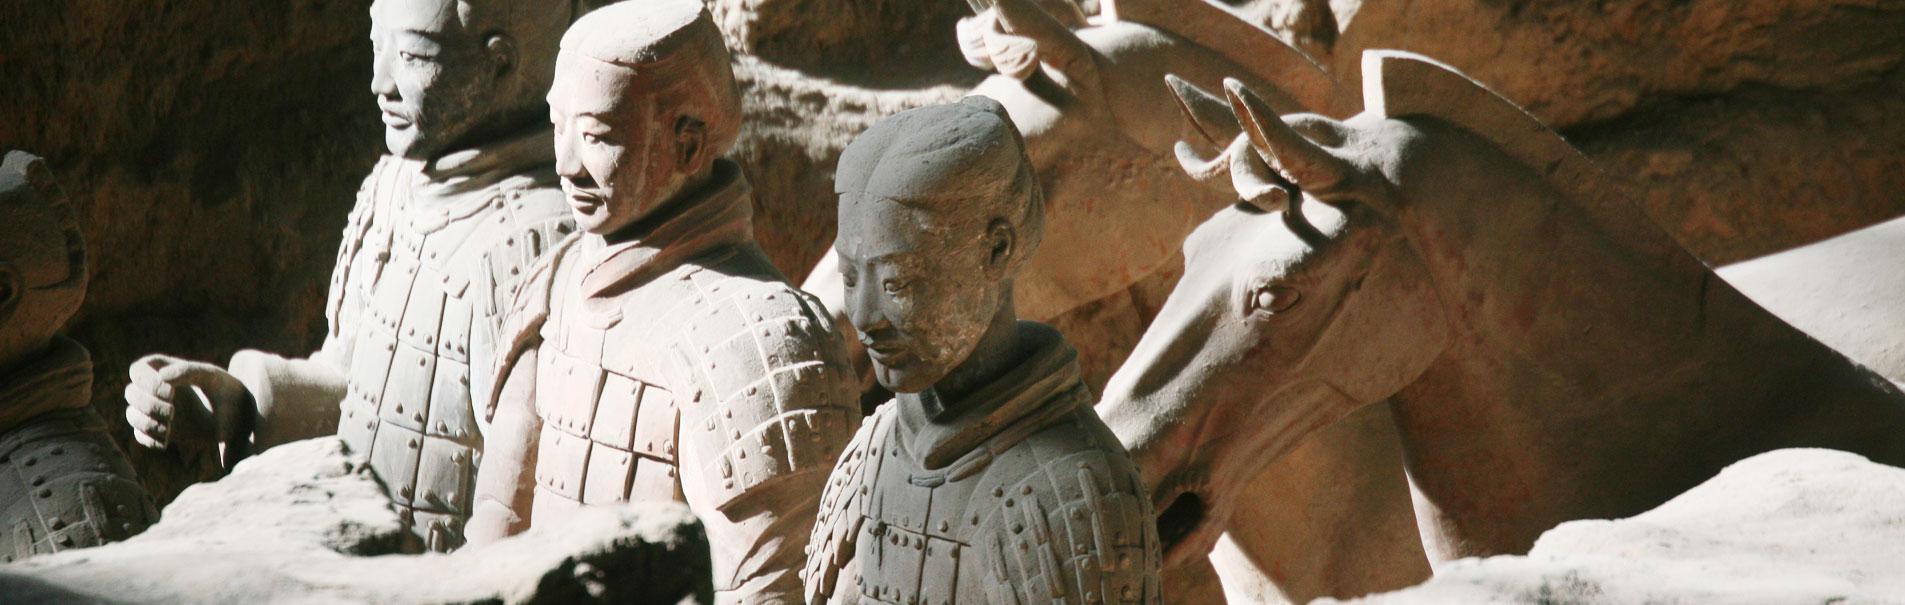 Terracotta Army, Xian